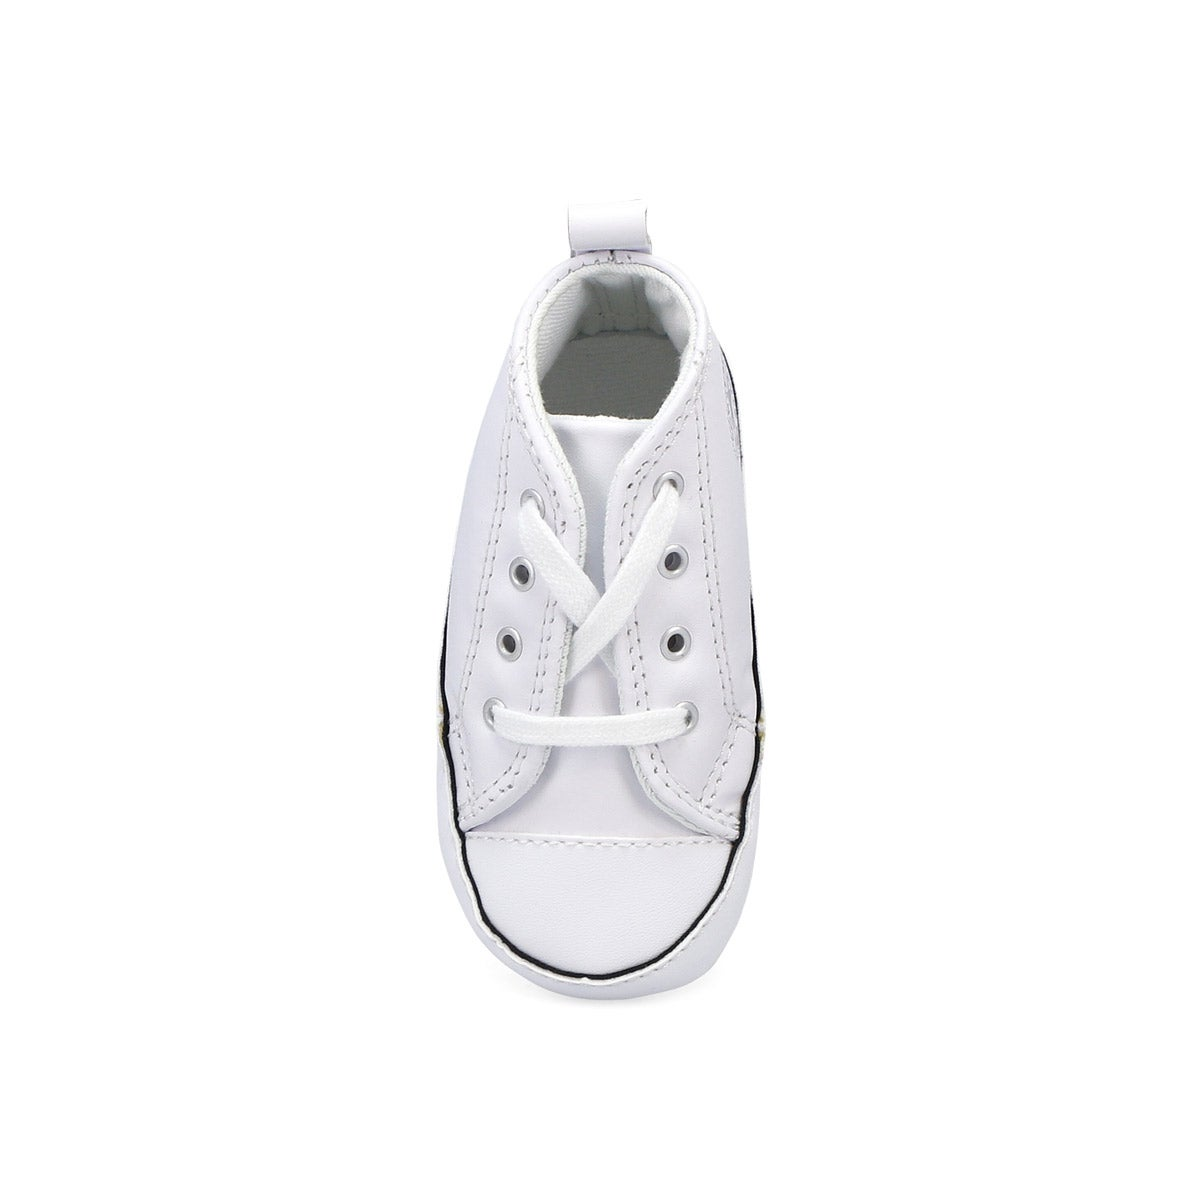 Inf CTAS Crib white leather sneaker